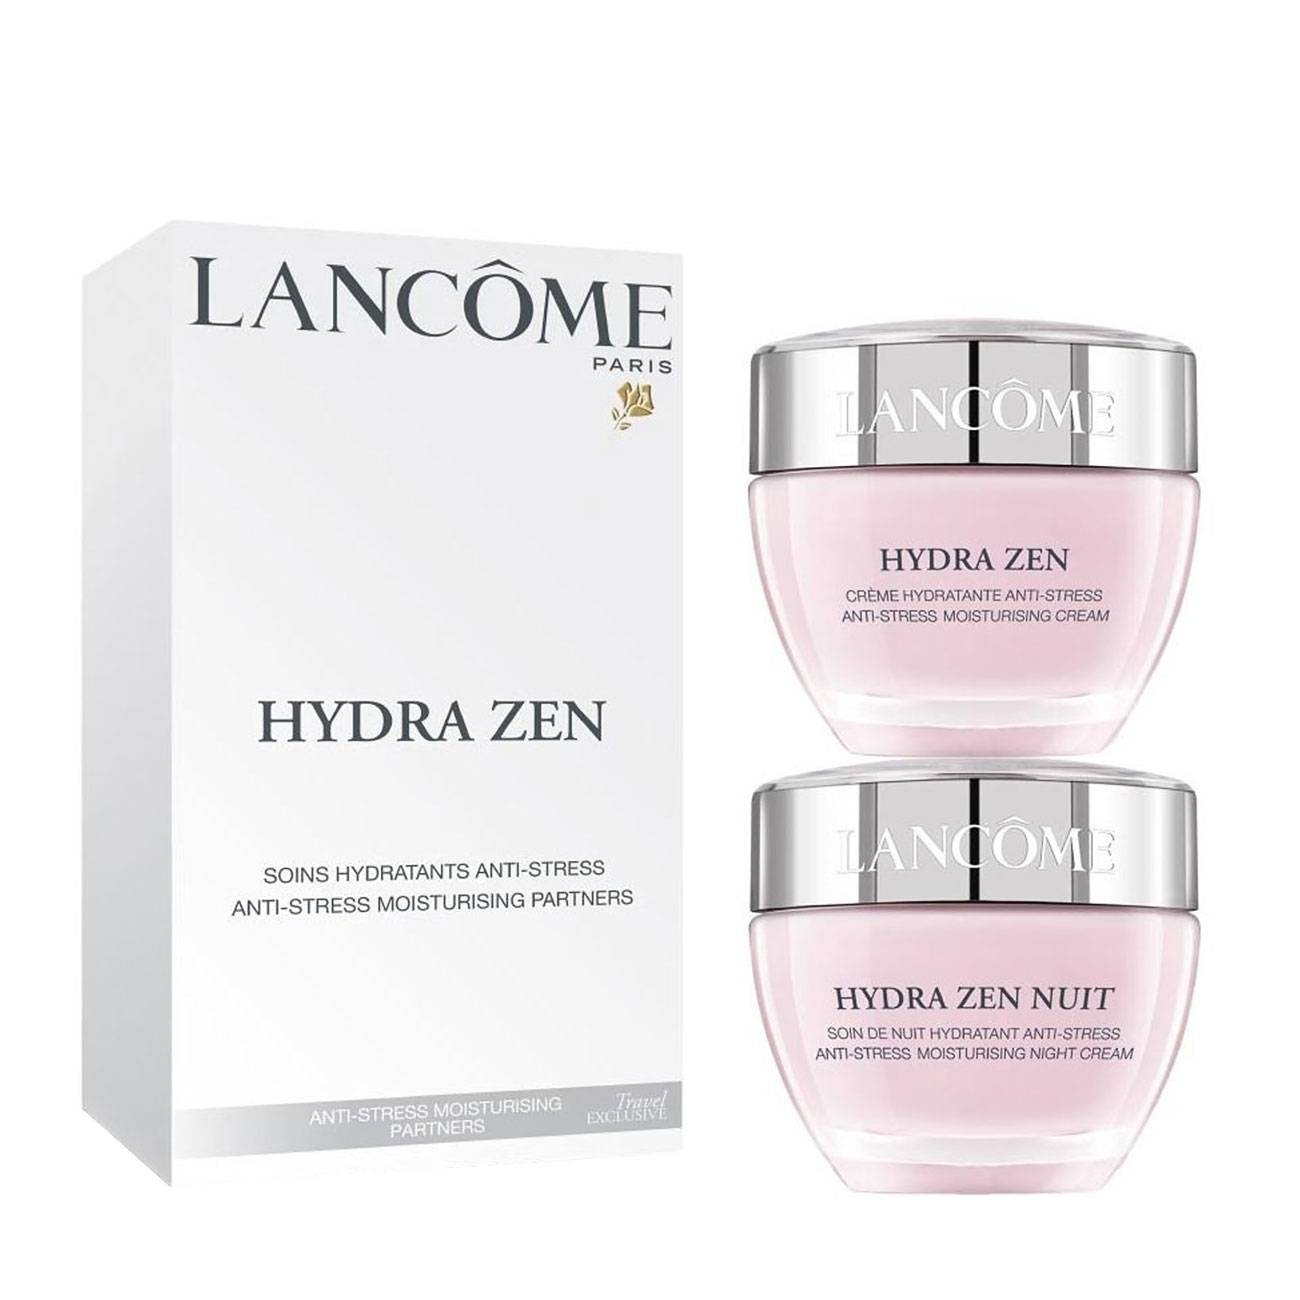 Hydrazen Set 100ml Lancôme imagine 2021 bestvalue.eu